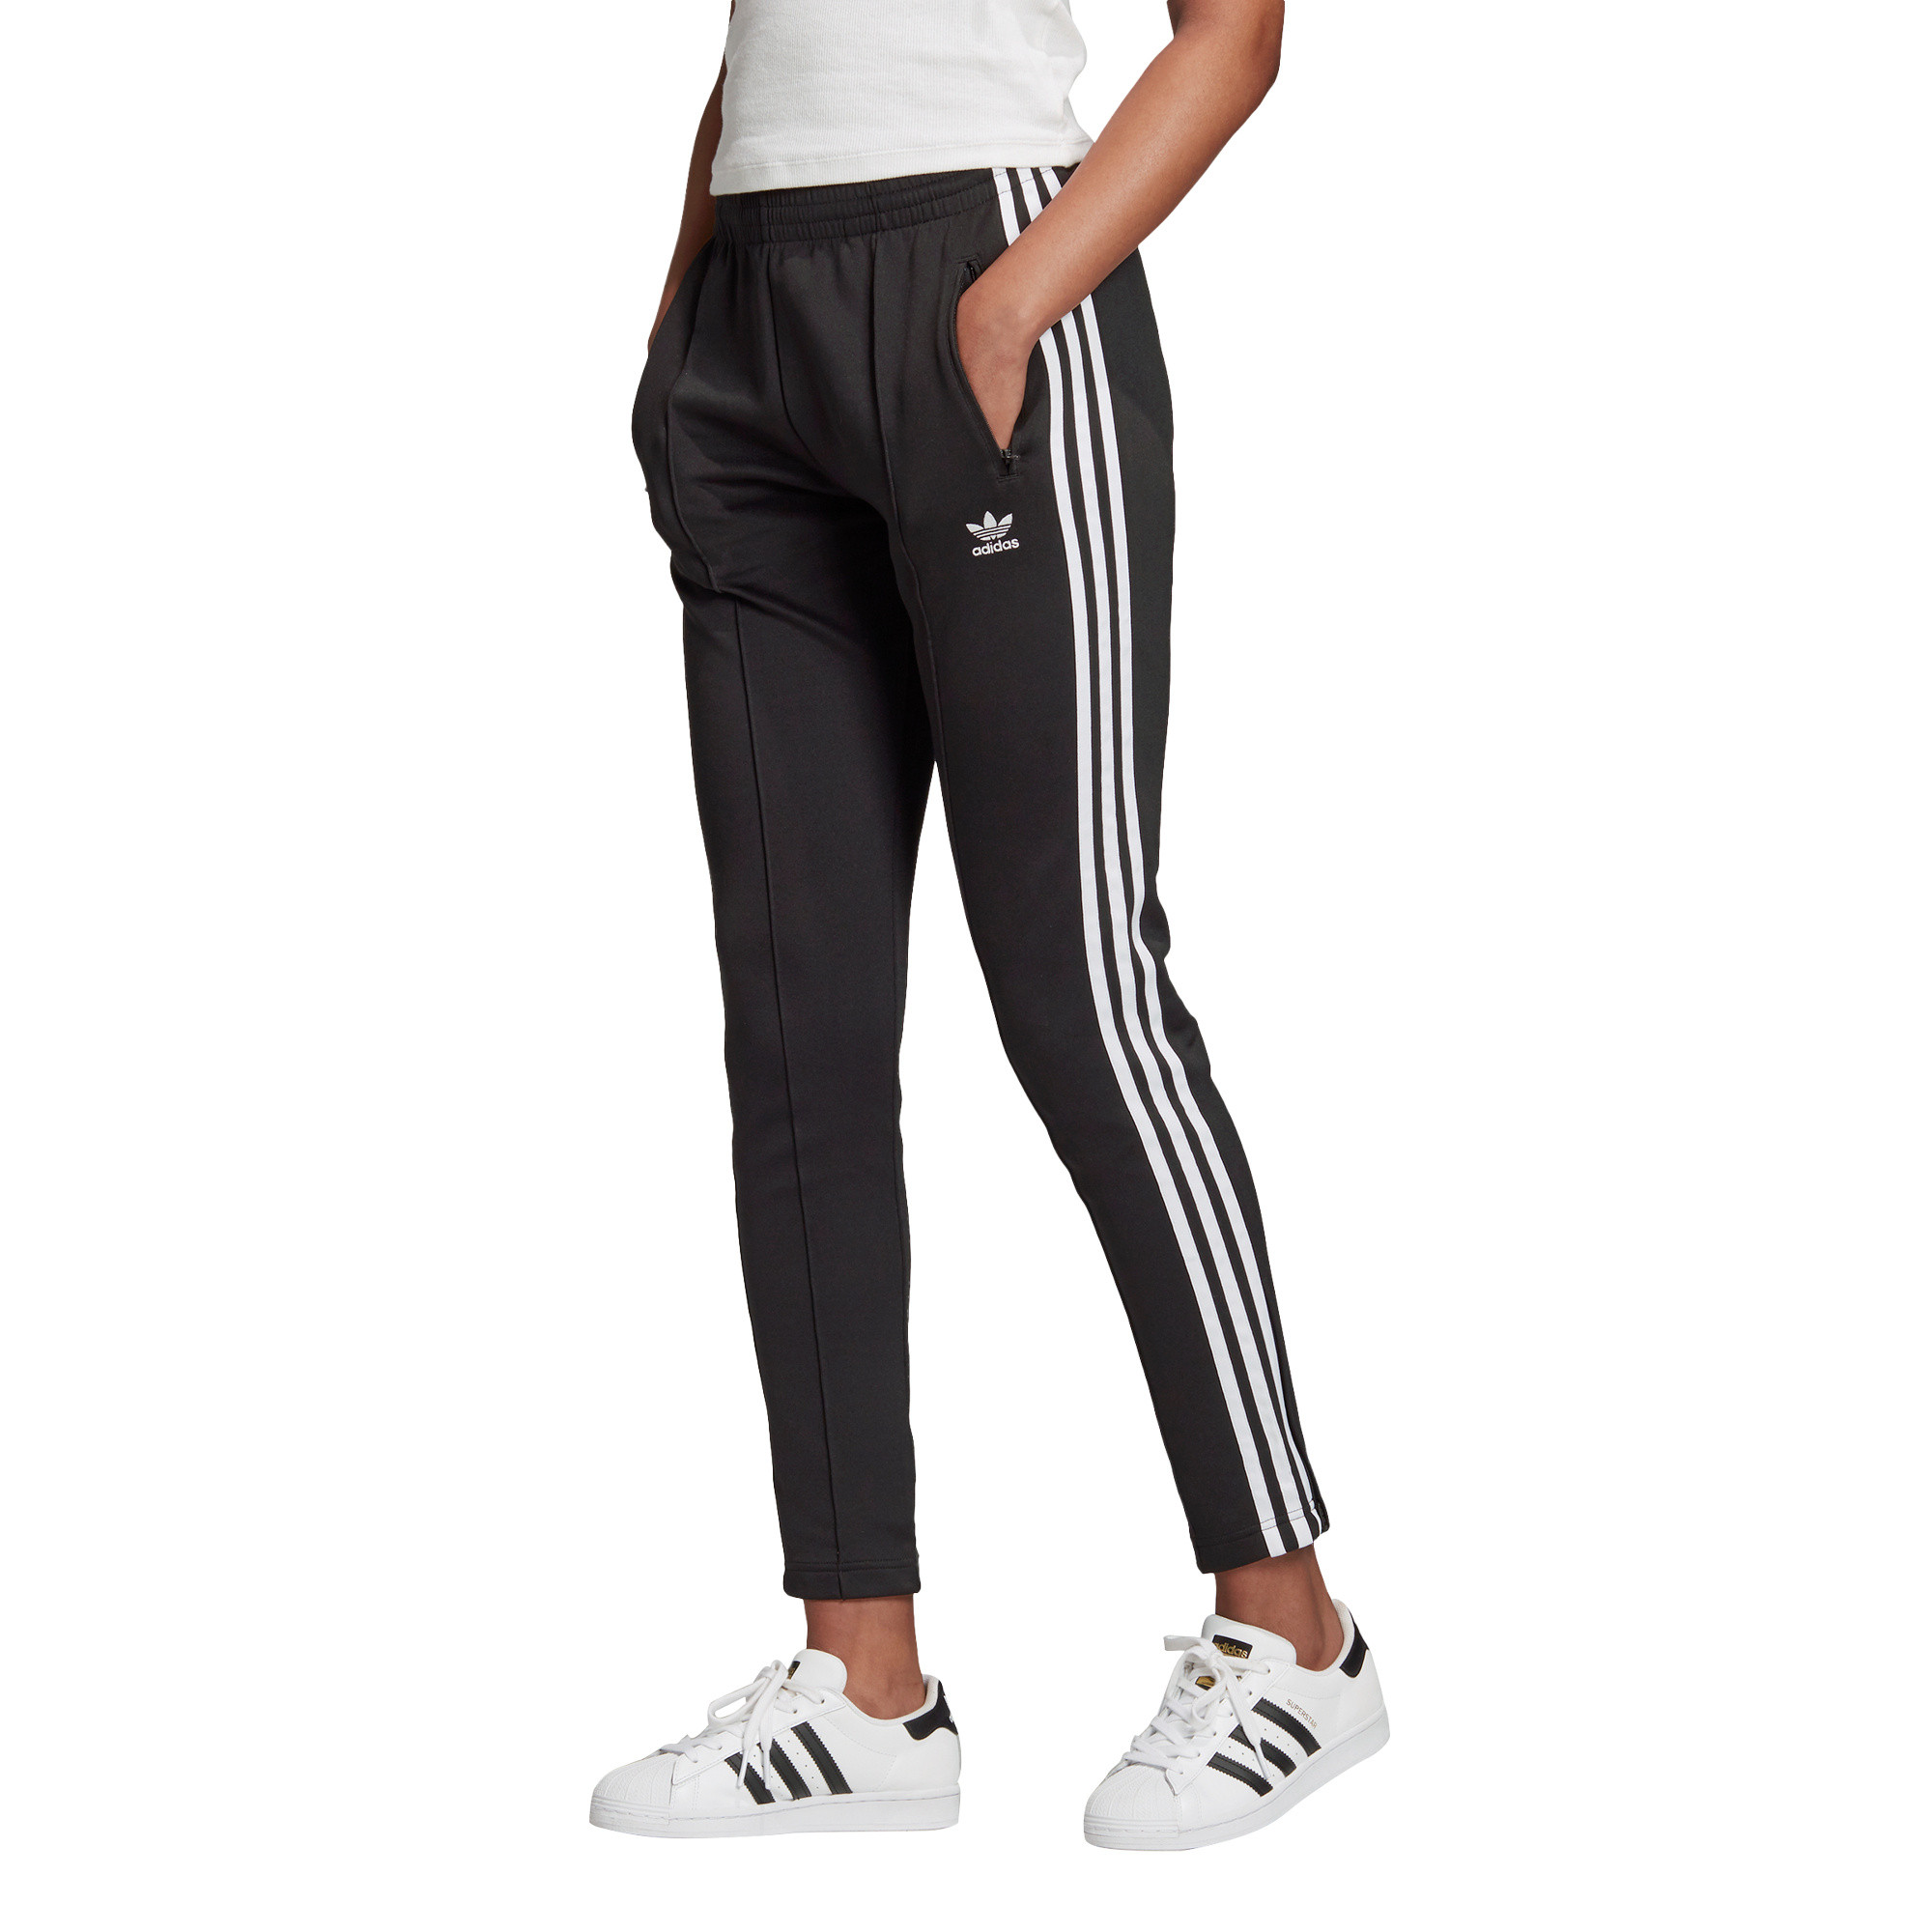 Pantaloni tuta Primeblue SST, Bianco/Nero, large image number 1